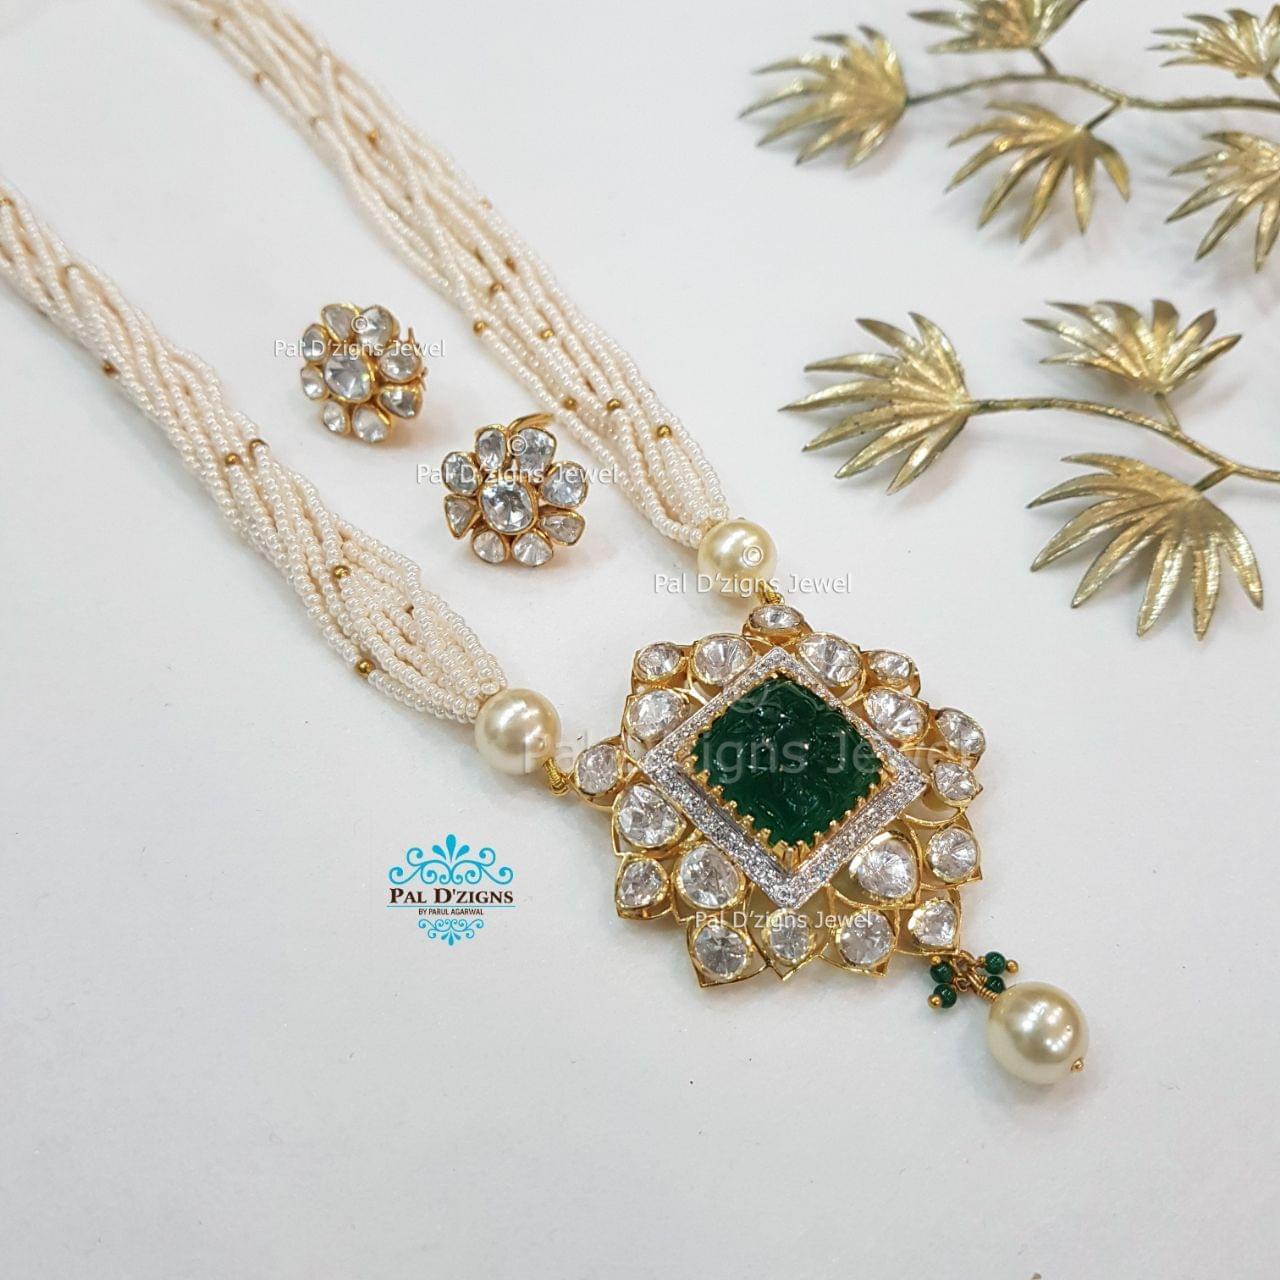 Astro Emerald moissanite pendant Set